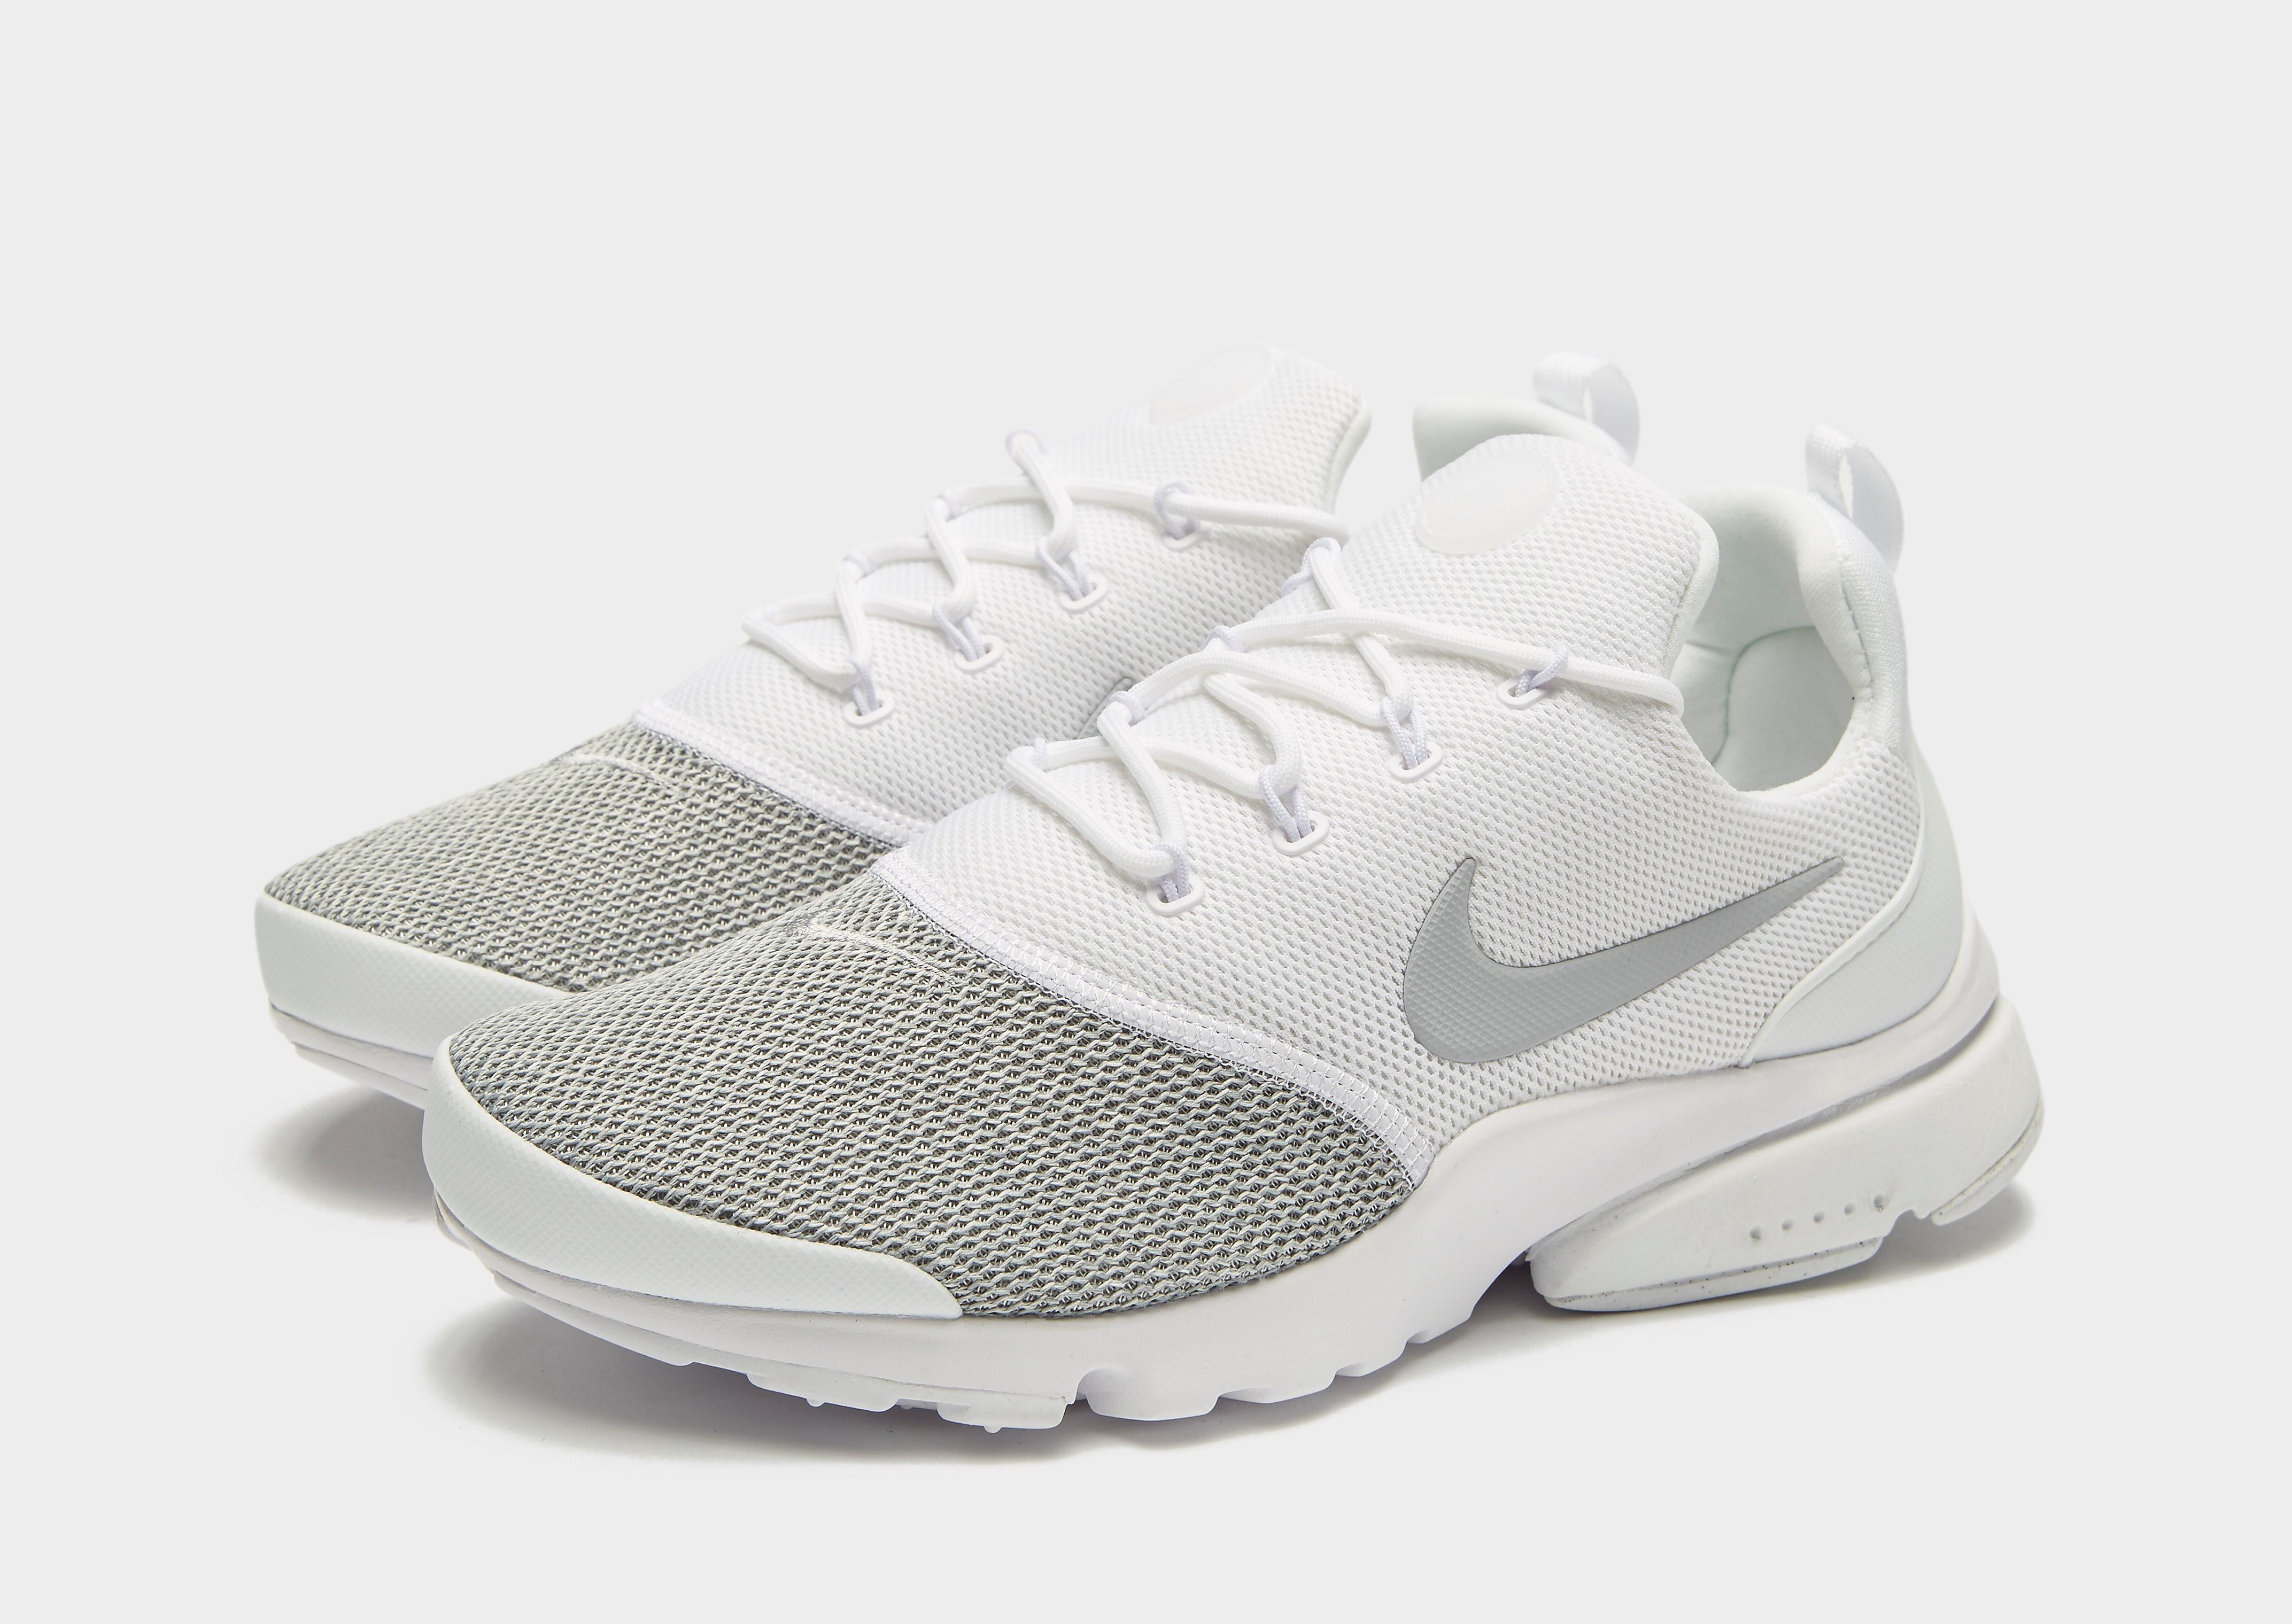 Nike Air Presto Fly SE Femme